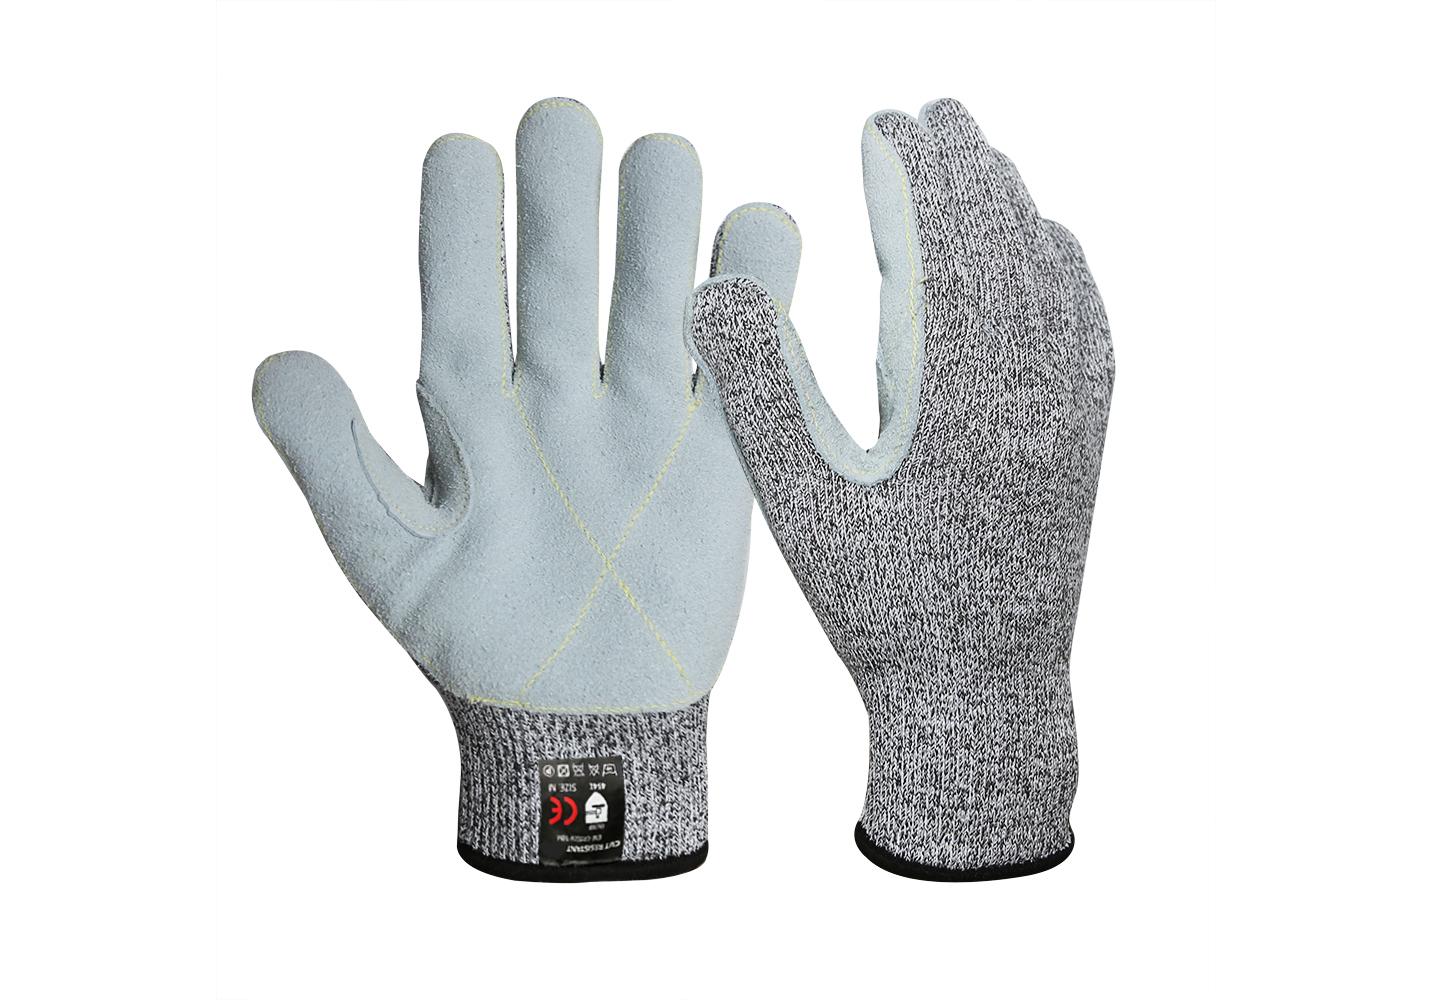 13G HPPE Cut Resistant Cow Split Leather Gloves/CRG-017